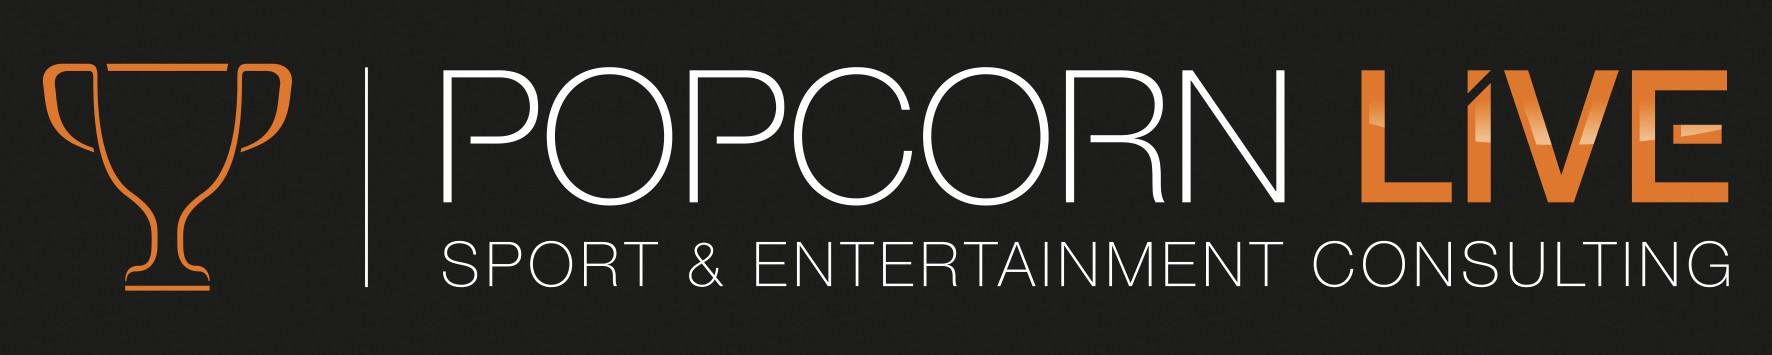 Popcorn Live logo for  Sport industry